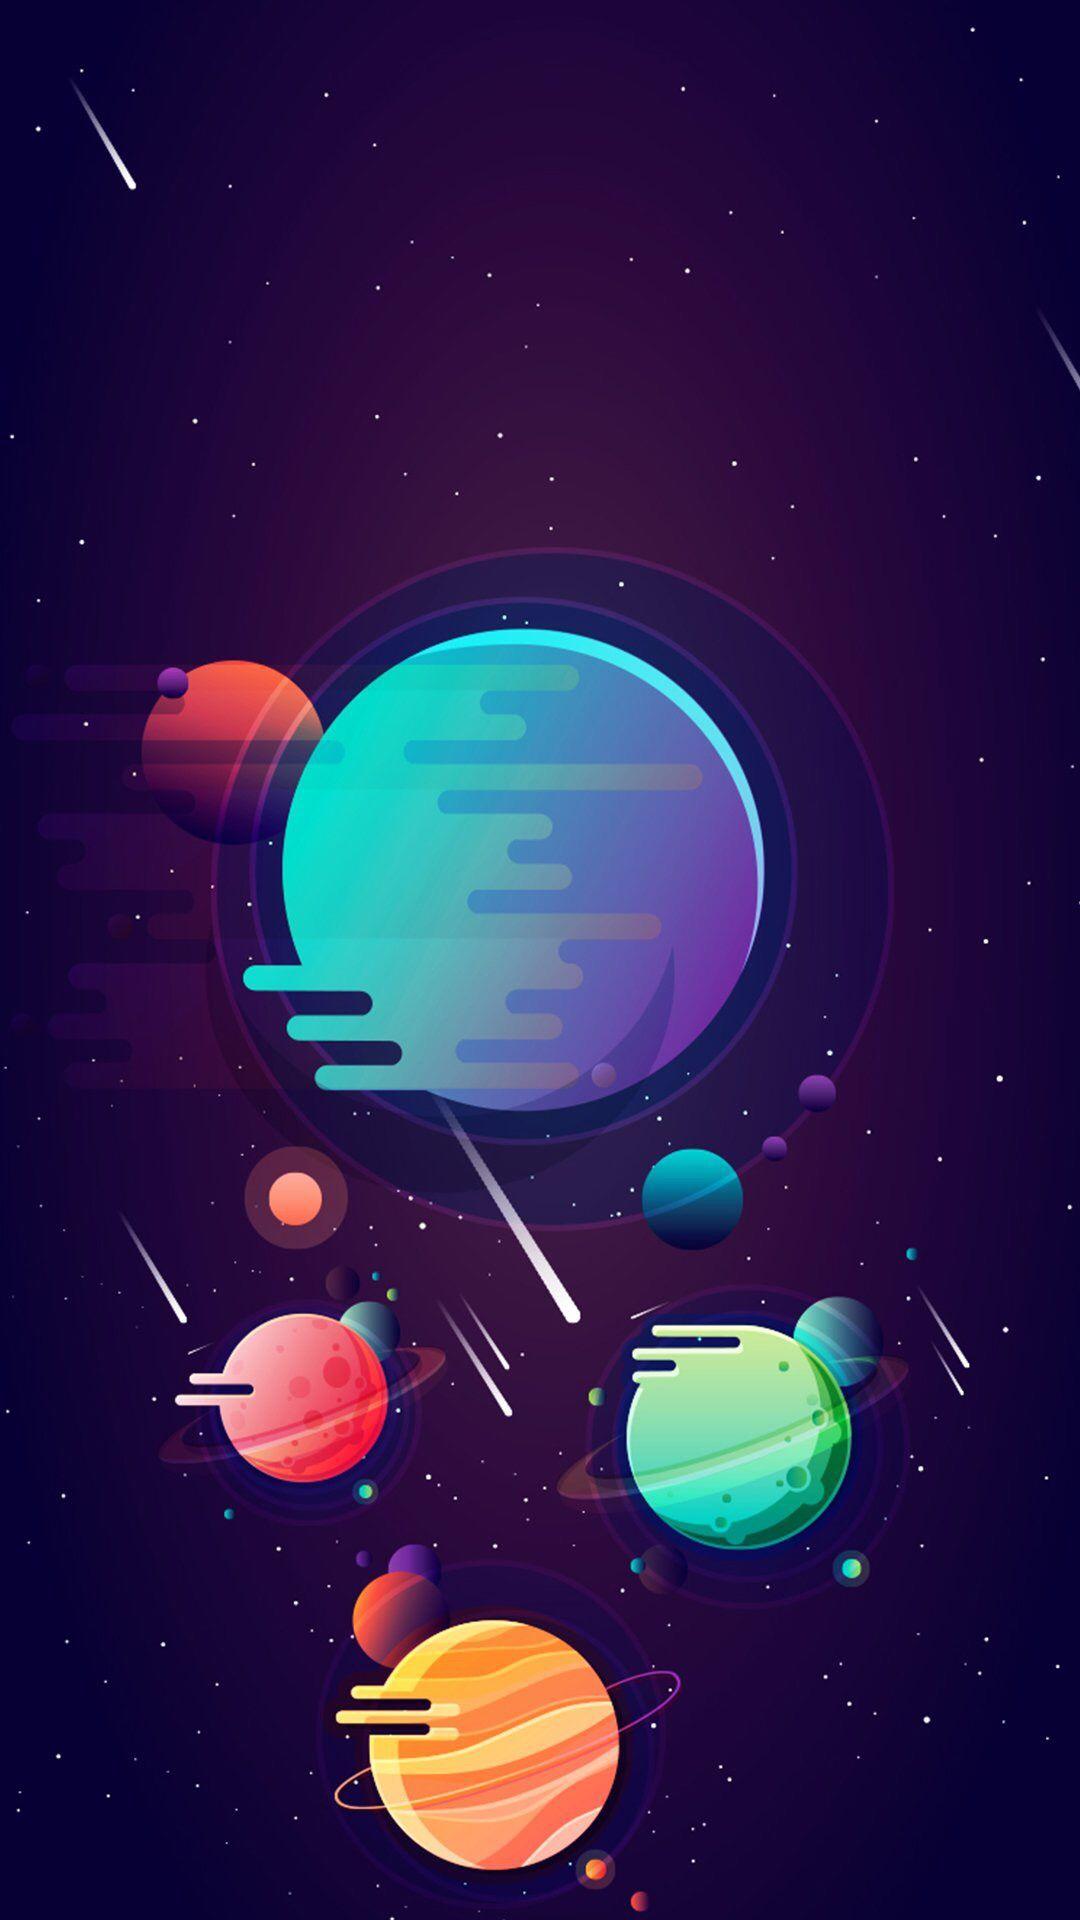 Fondos Space Art Galaxy Wallpaper Smartphone Wallpaper